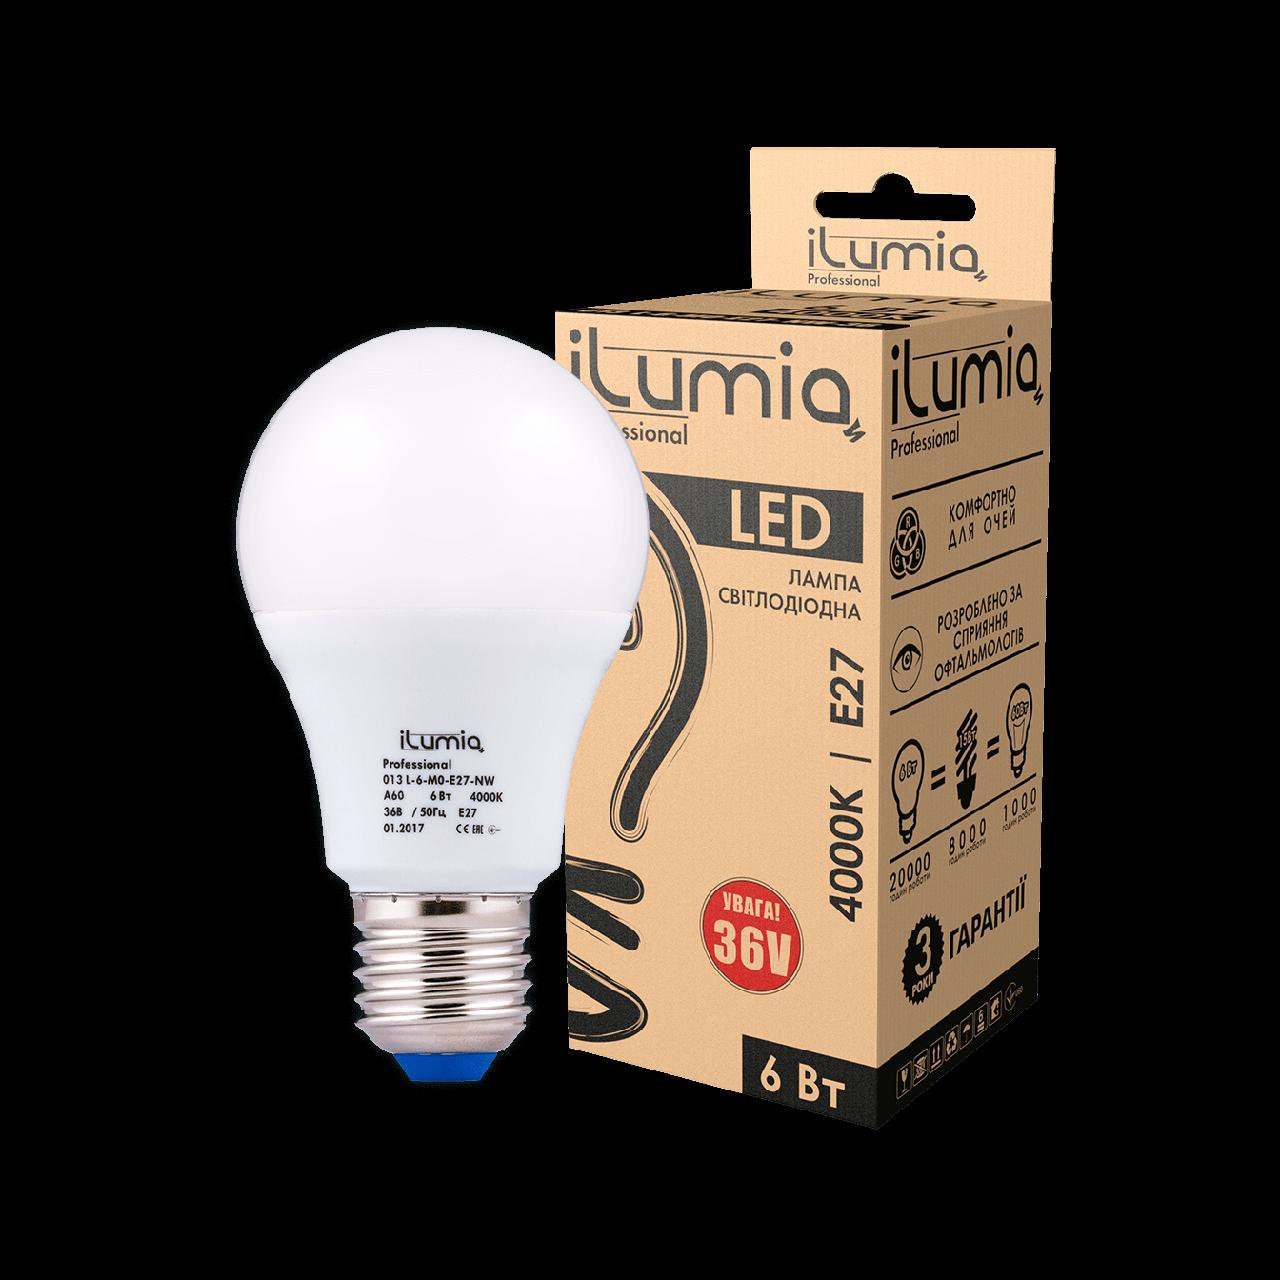 LED лампа Ilumia низковольтная 6W 36V Е27 A60 4000К нейтральный (013)